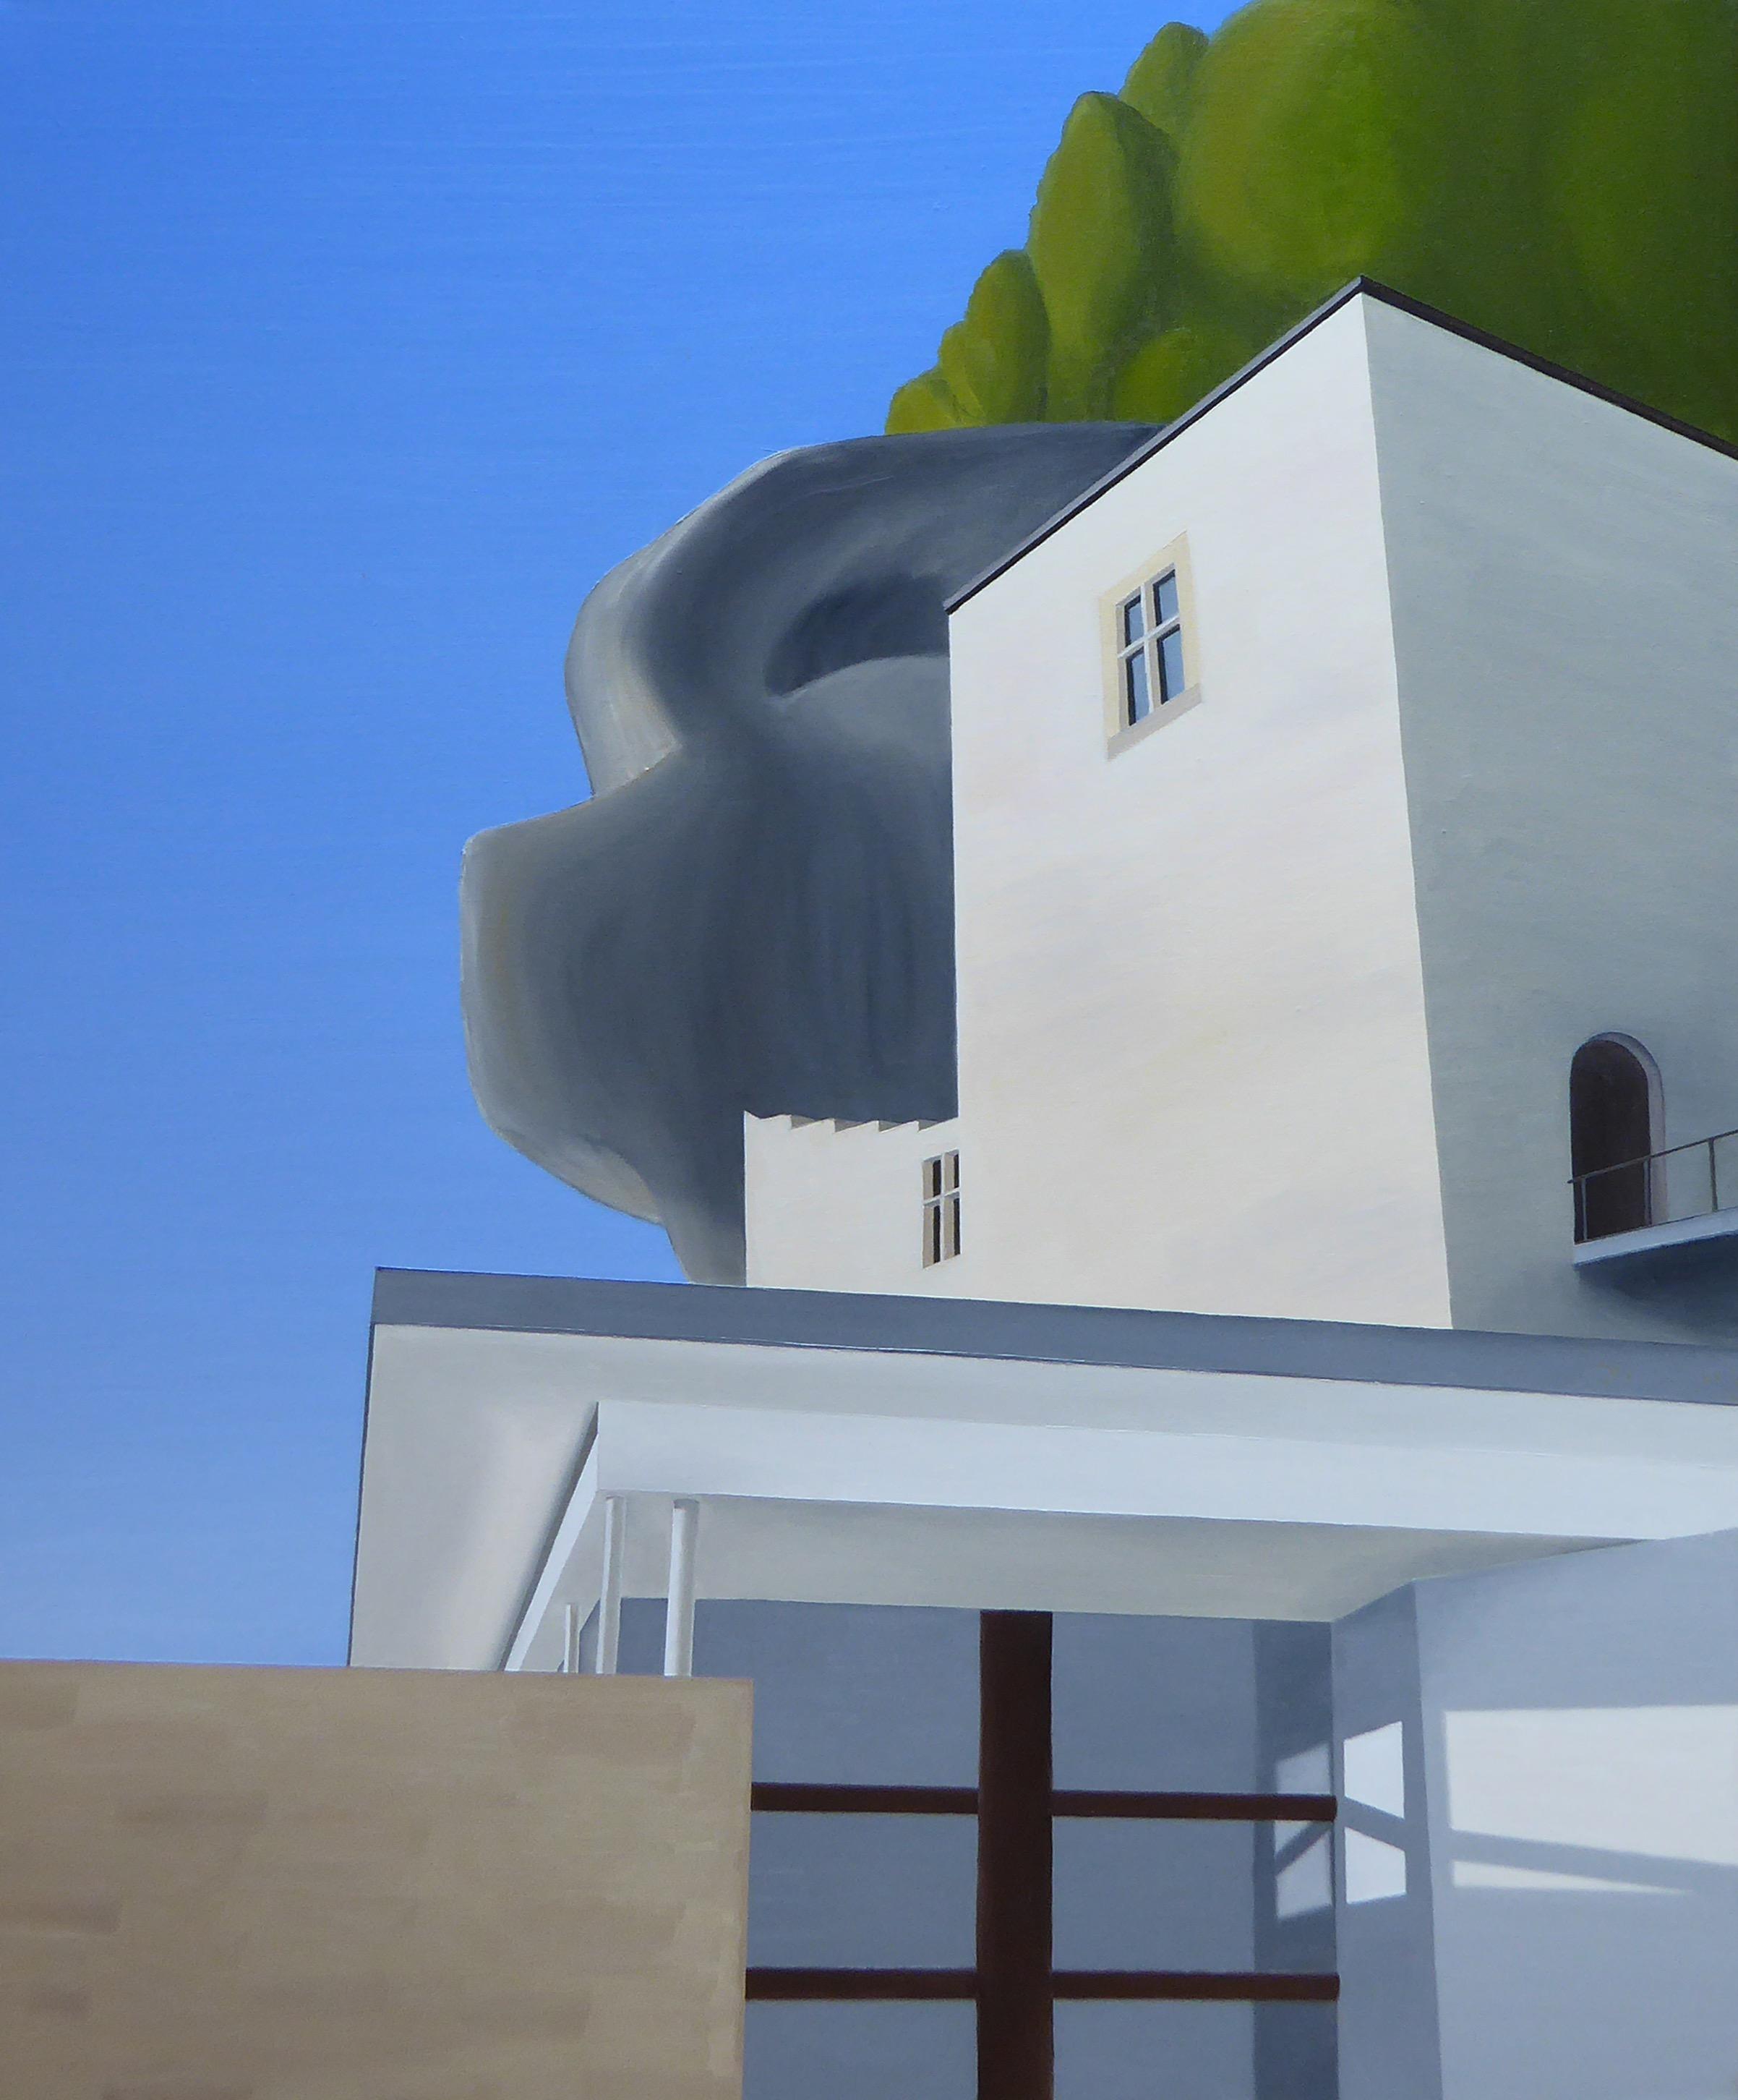 Les Eyzies I, olja/duk, 65x81 cm